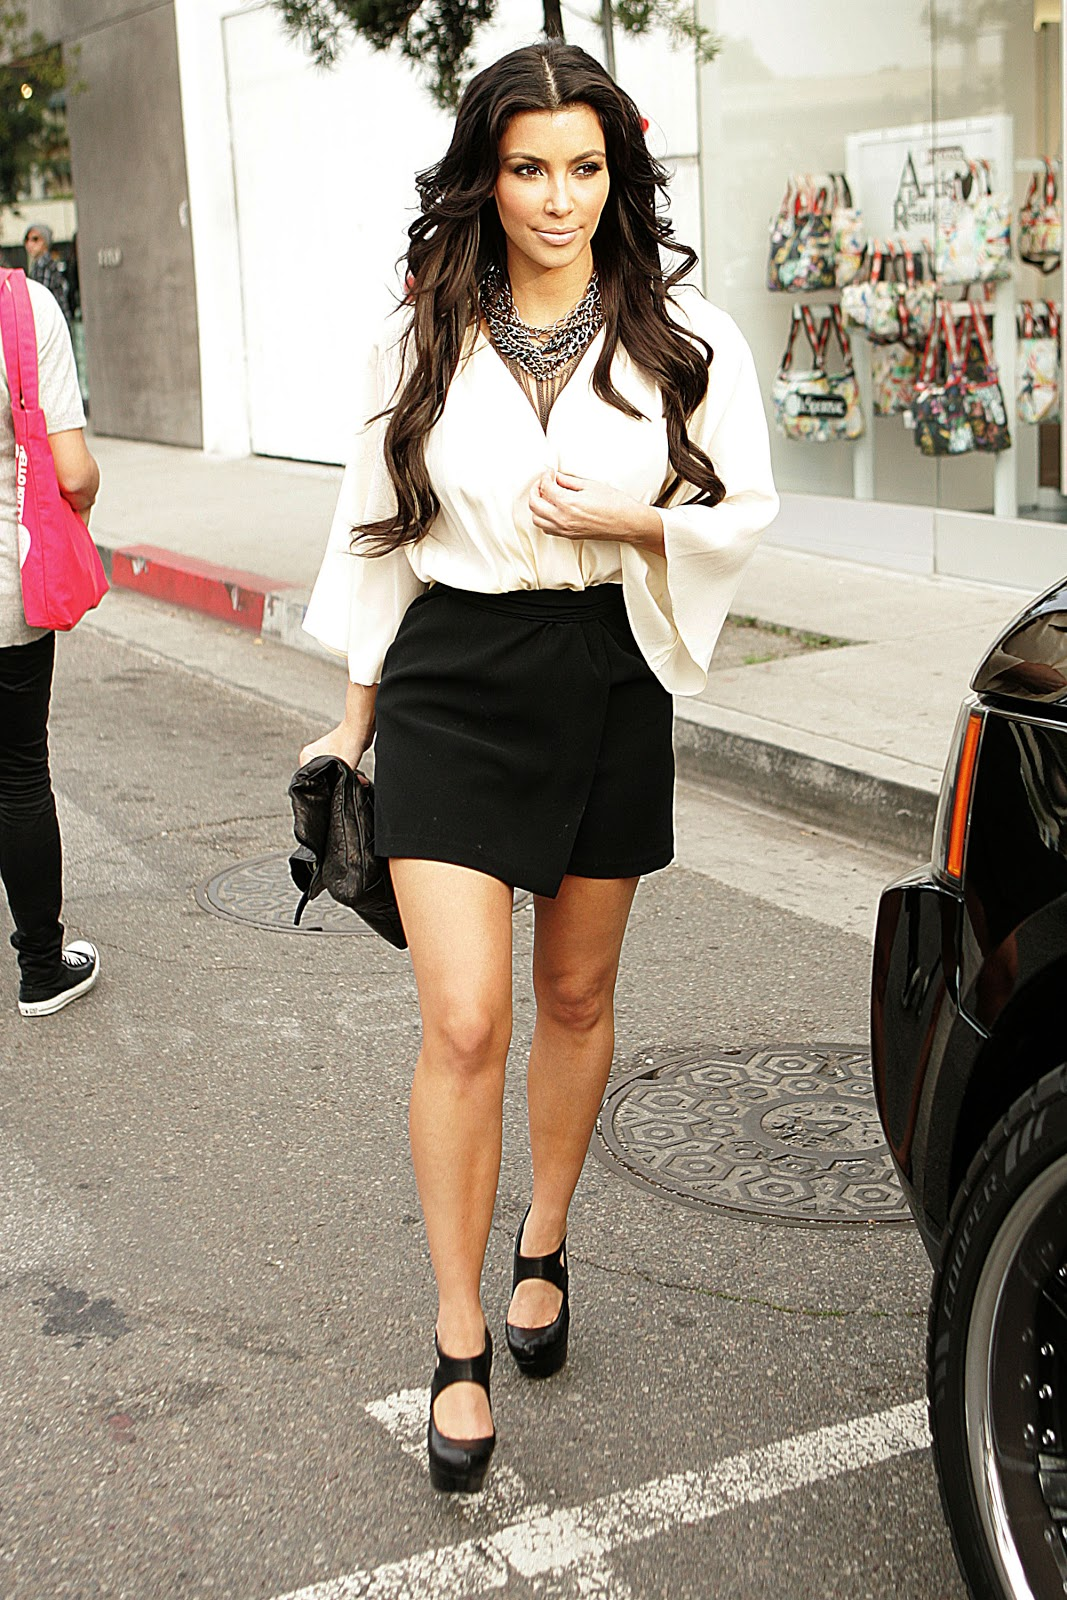 http://1.bp.blogspot.com/-h7WPQ-S1IIA/TwG4LkCnIOI/AAAAAAAAA1g/0pdPziF08YQ/s1600/Kim_Kardashian_2010-01-09_-_leaves_a_Pepsi_Pop_Up_Store1.jpg